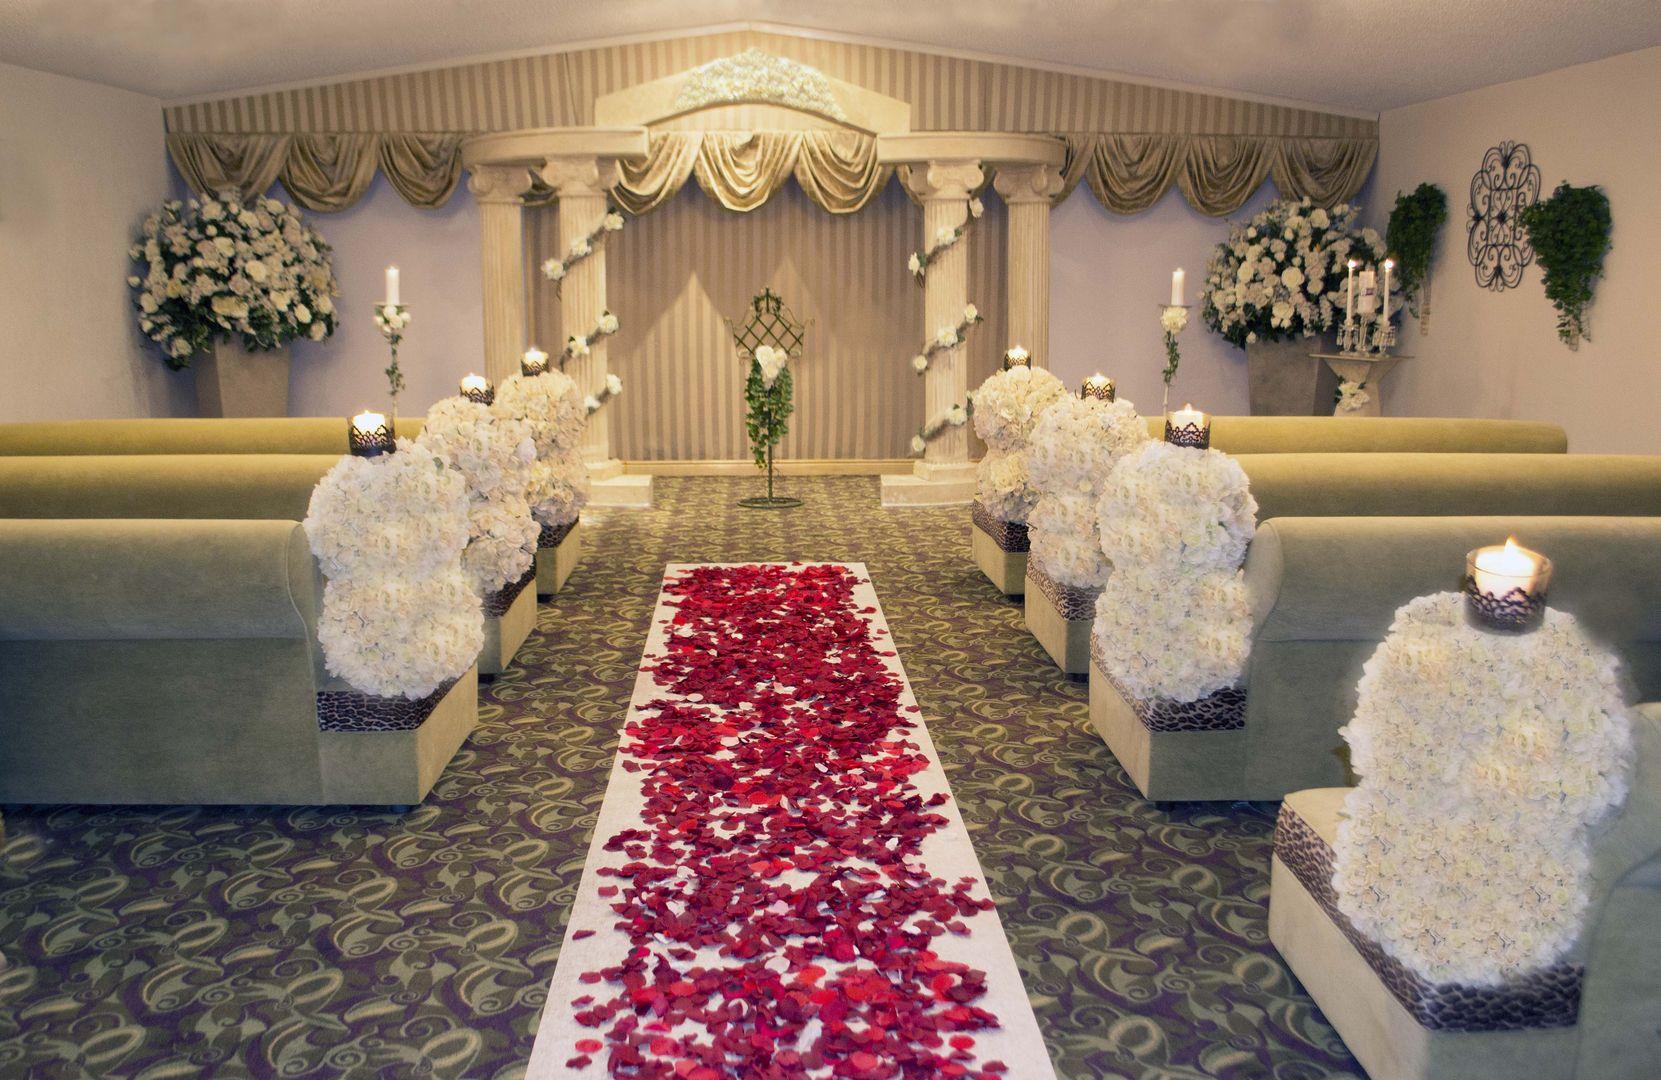 Las Vegas Wedding Chapels Wedding Chapels In Las Vegas Weddings In Vegas Las Las Vegas Wedding Chapel Las Vegas Wedding Packages Cheap Las Vegas Weddings